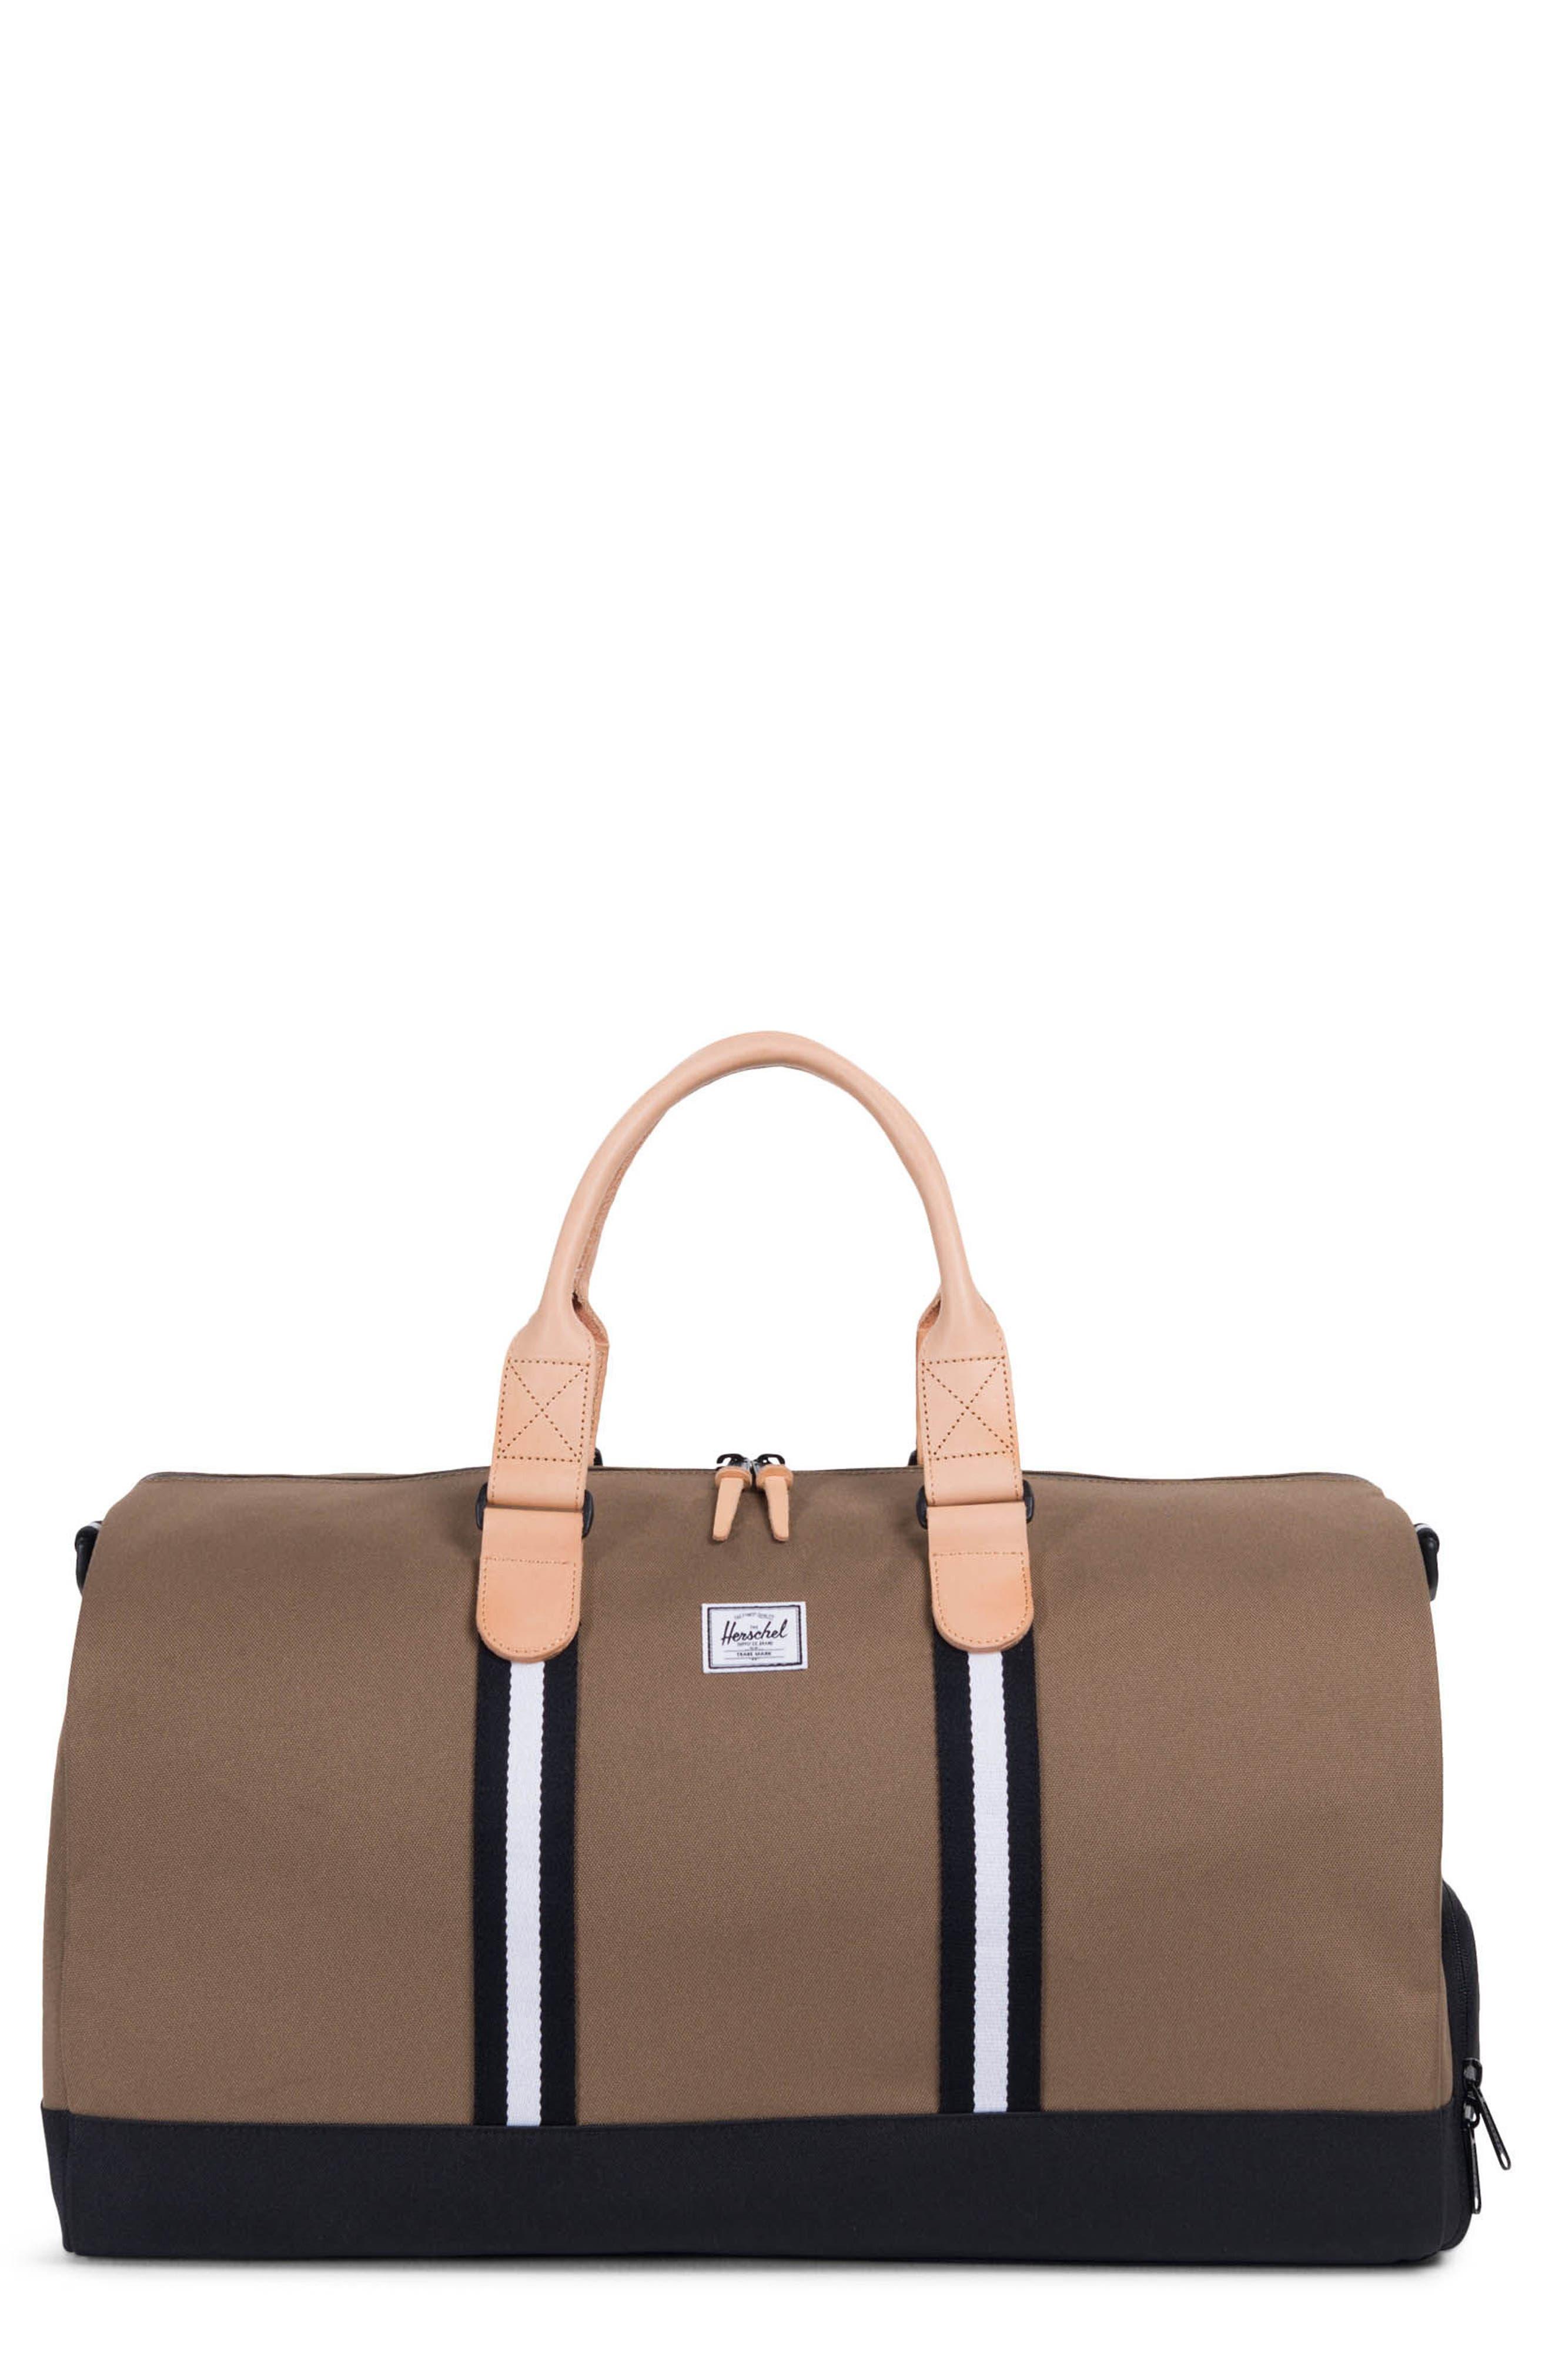 Novel Duffel Bag,                         Main,                         color, Cub/ Black/ White